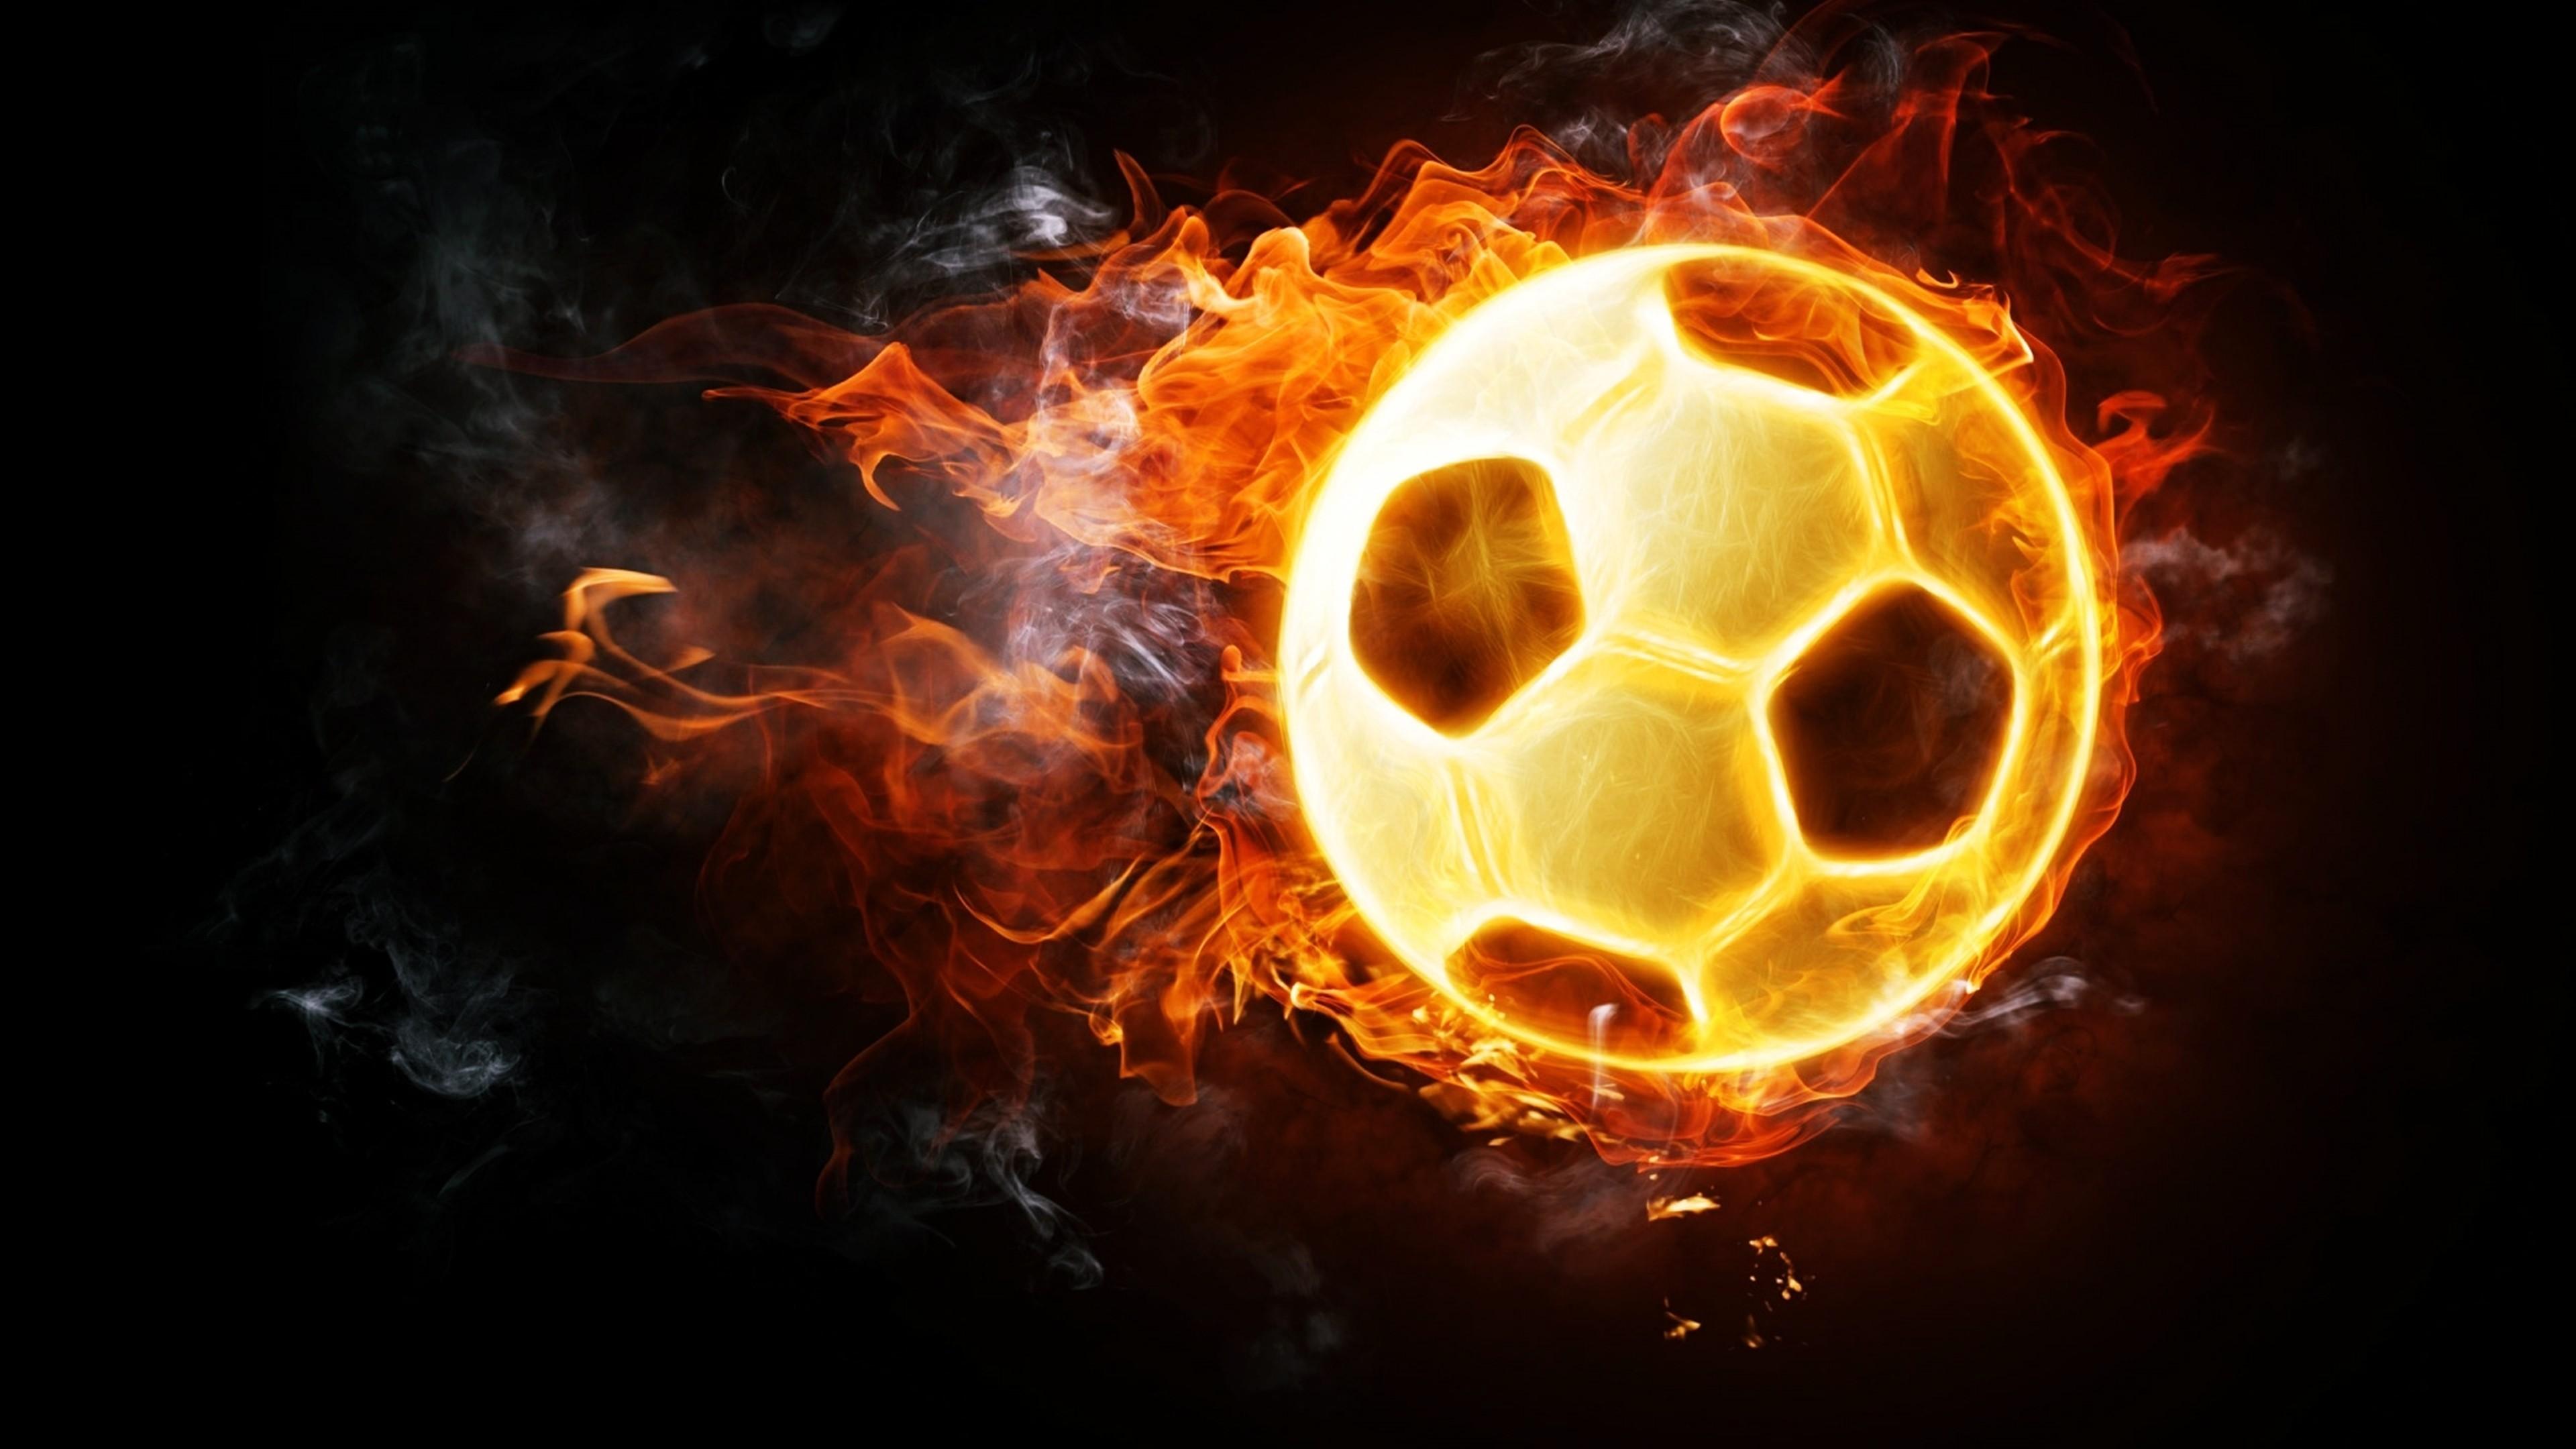 football soccer fire ball 4k 1538786825 - Football Soccer Fire Ball 4k - sports wallpapers, soccer wallpapers, hd-wallpapers, football wallpapers, 4k-wallpapers